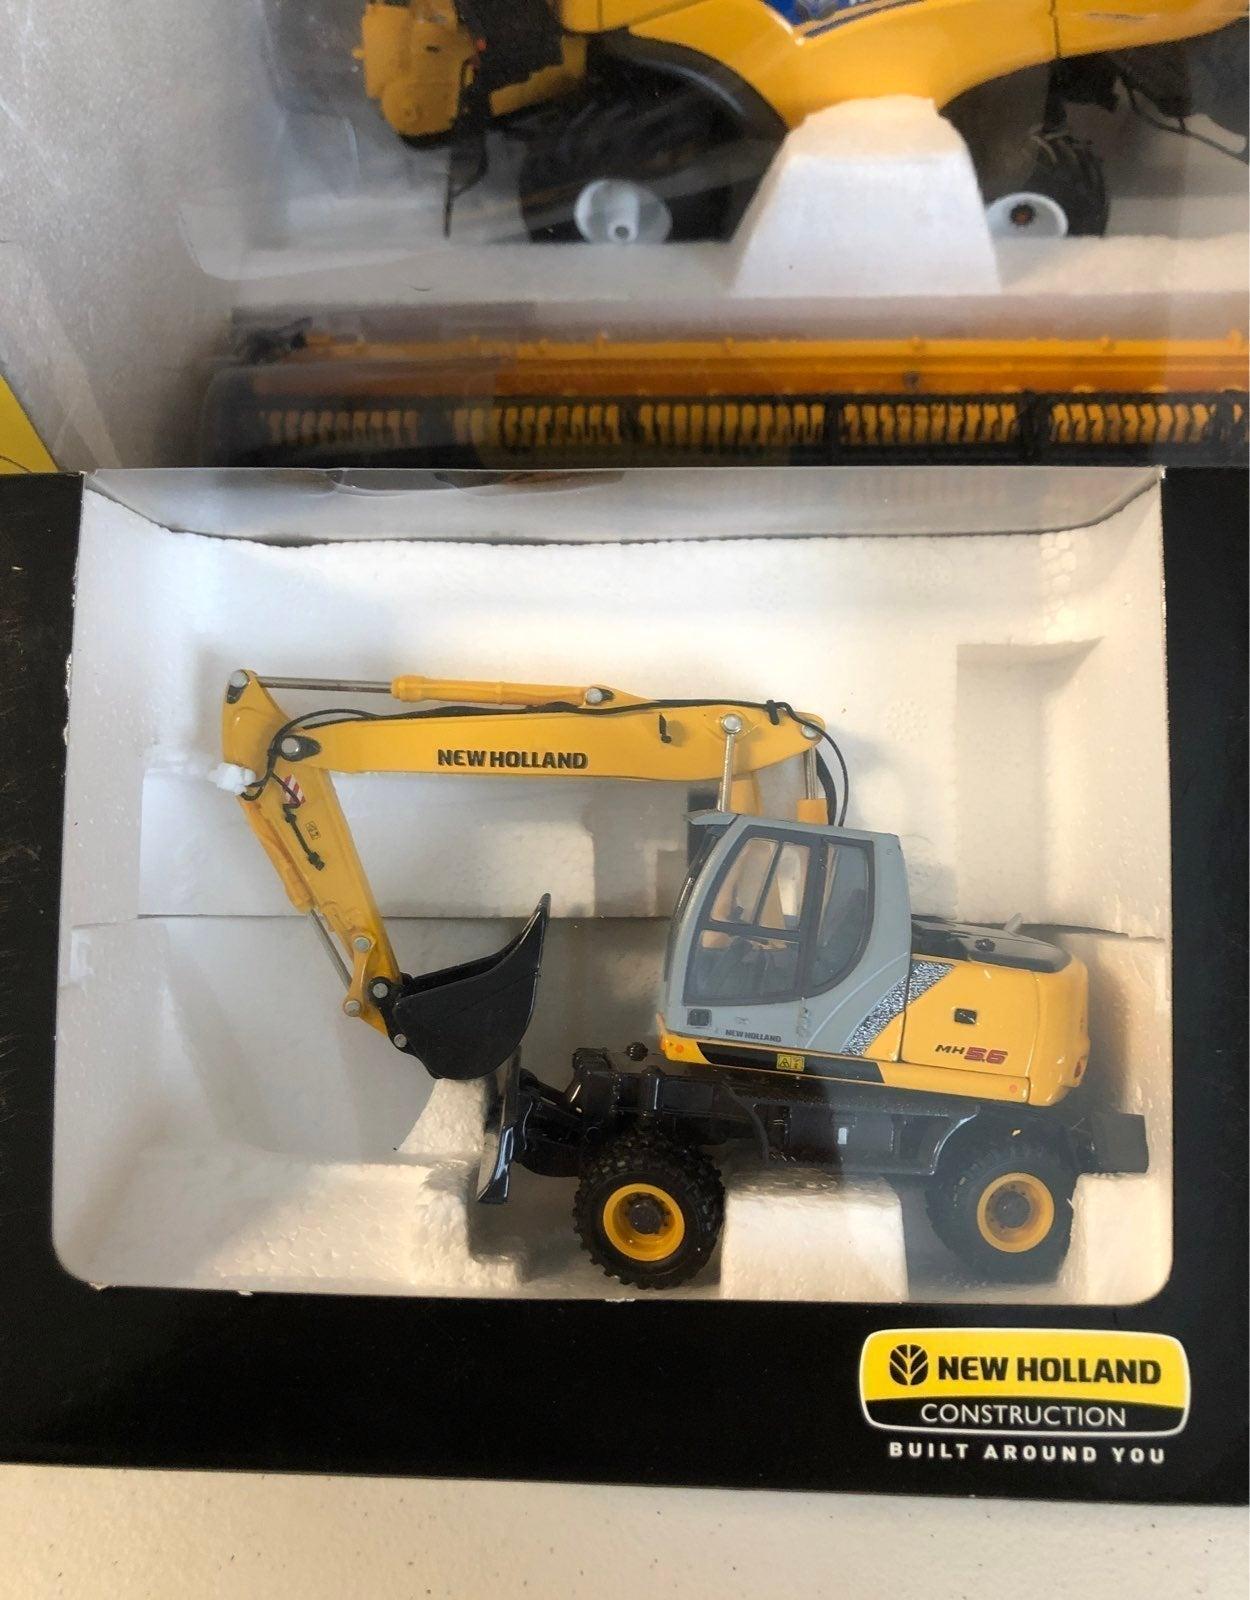 New holland mh5.6 excavator 1:50.